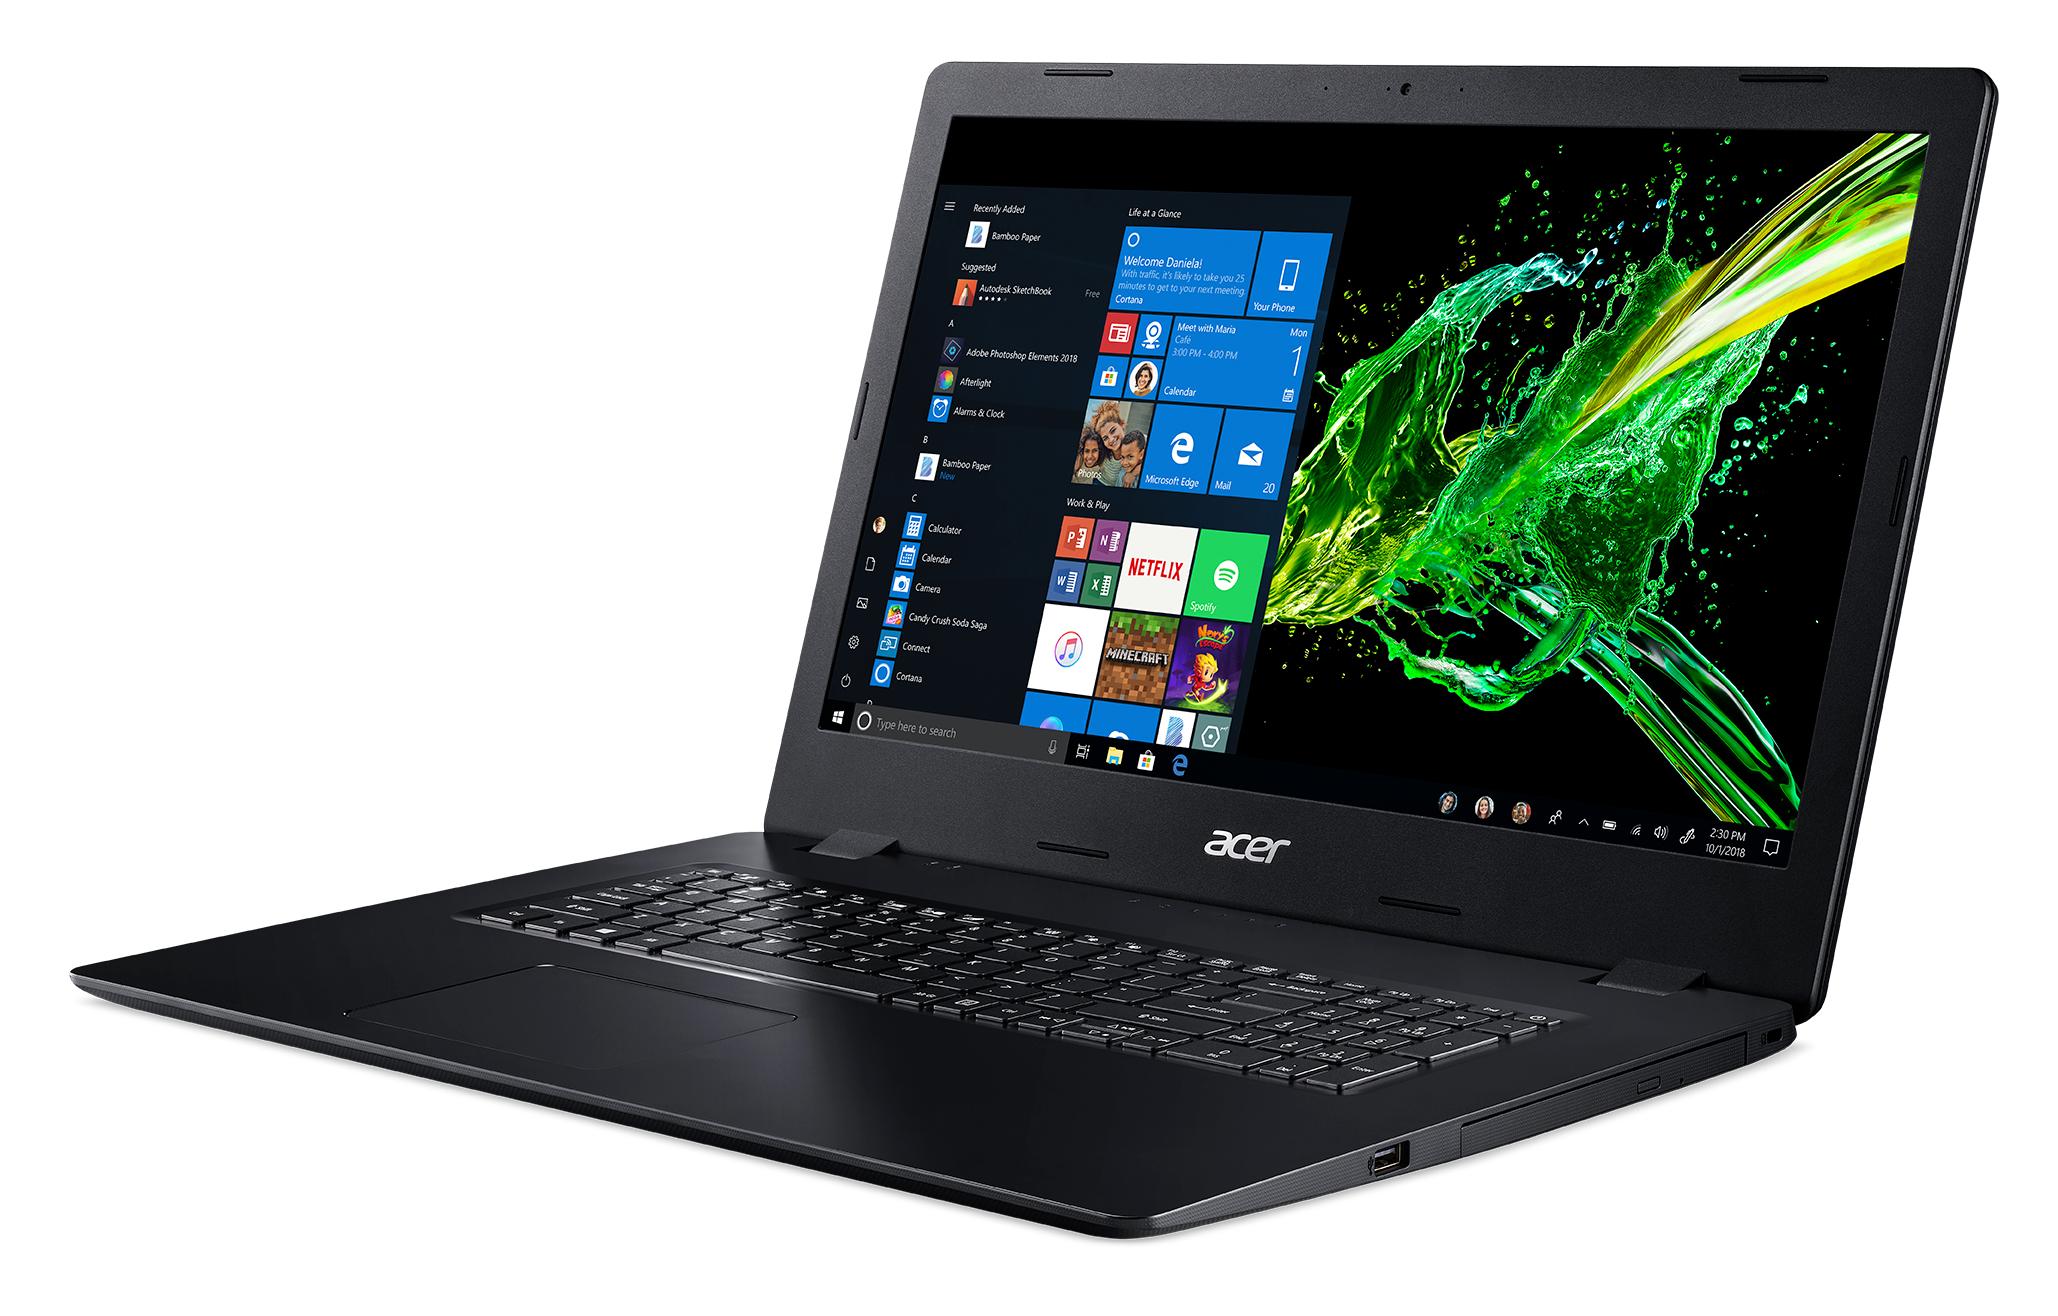 Acer Aspire A317-51-33KG, 17.3inch HD+ CineCrystal, Intel Core i3-10110U, 4GB, 256GB PCIe NVMe SSD, Intel UHD Graphics 620, DVD-RW, Wi-Fi 5 AC + BT, Win10Pro , US Intl keyboard